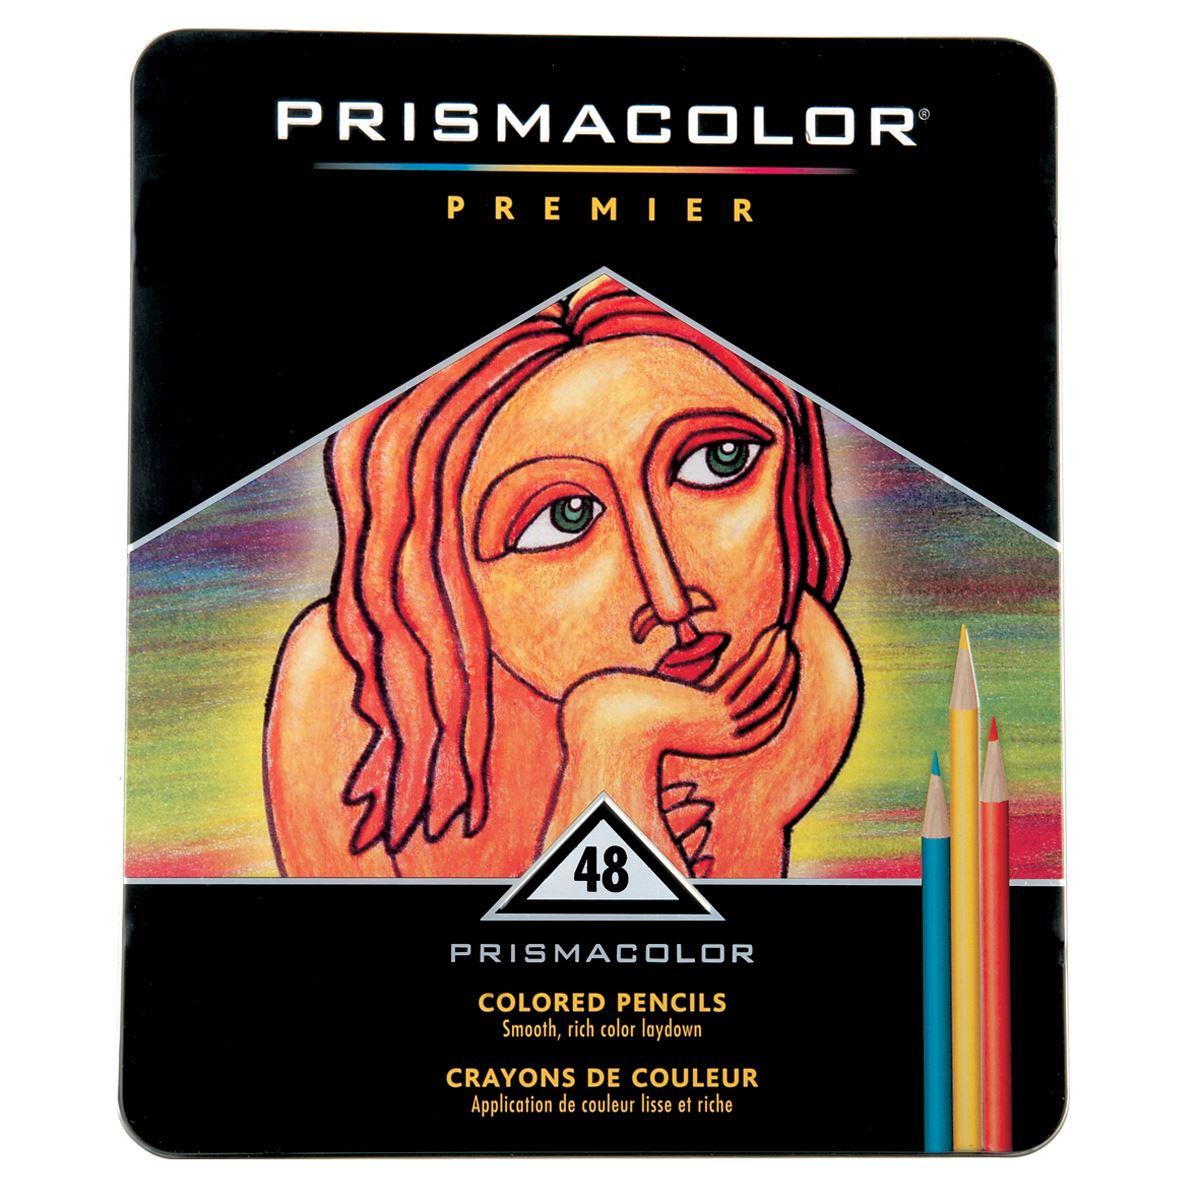 Prismacolor Premier 48 piezas